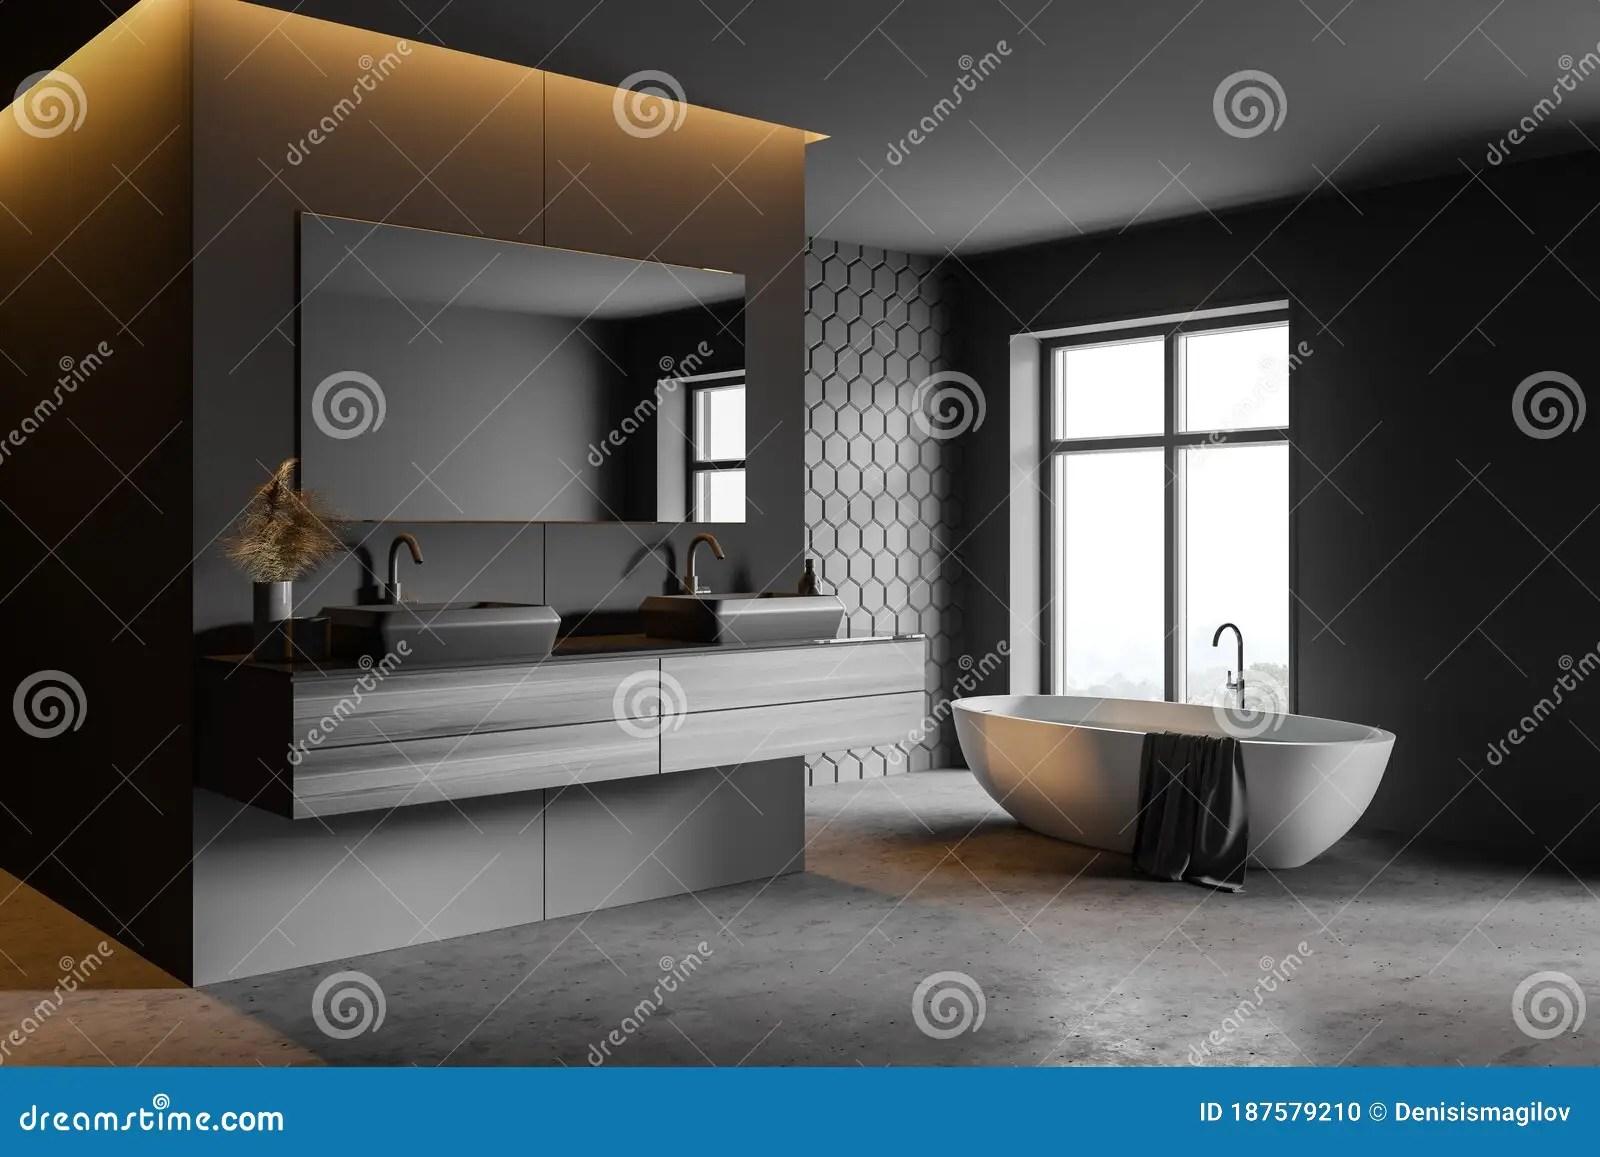 grey honeycomb tile bathroom corner stock illustration illustration of furniture apartment 187579210